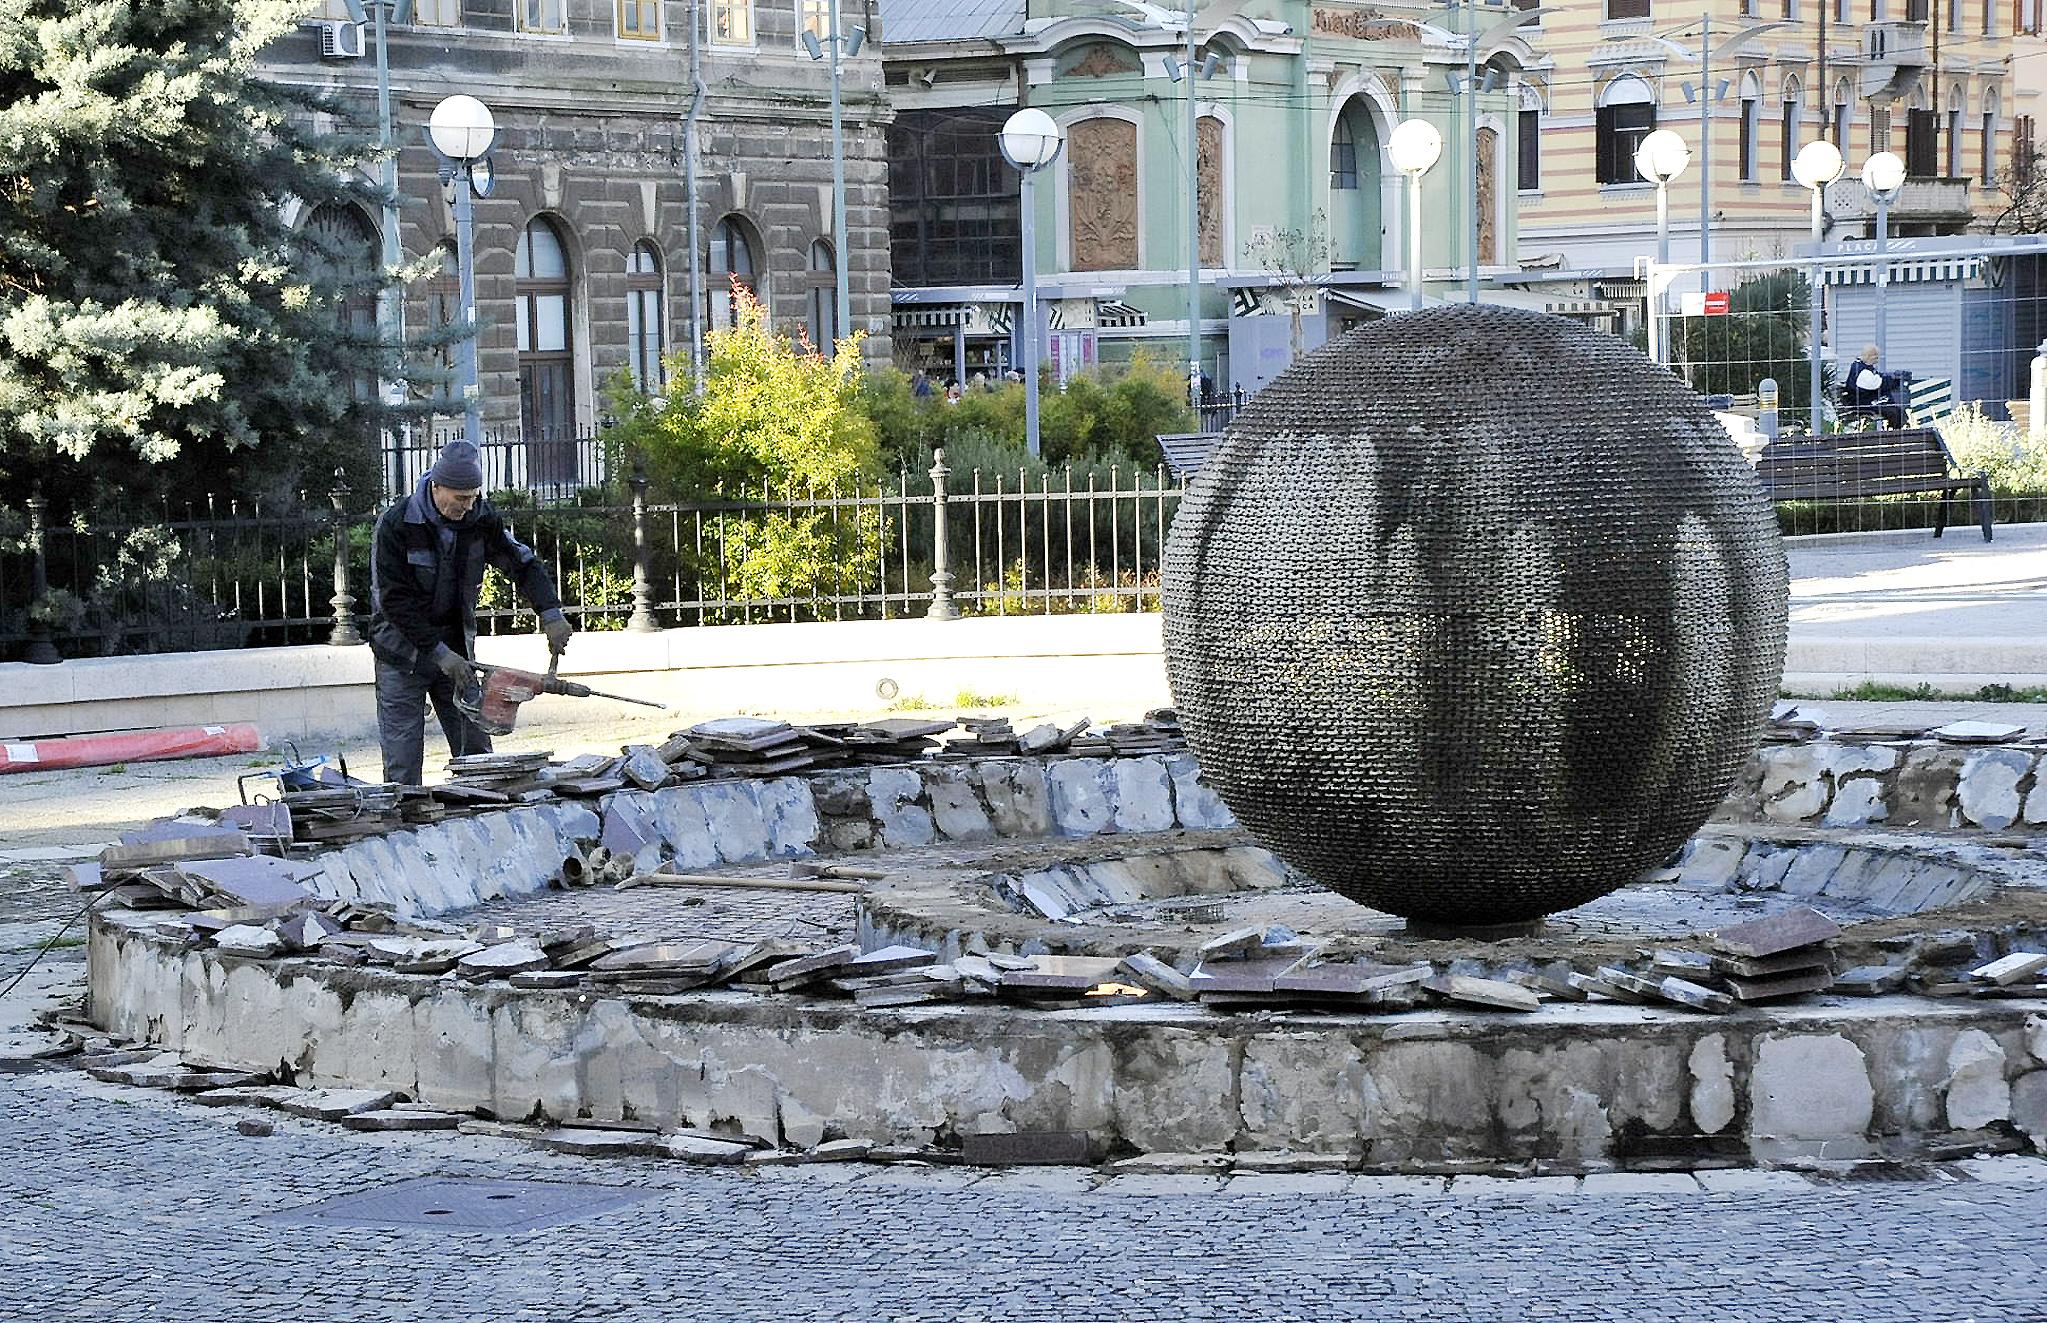 Obnovit će se i Džamonjina fontana / Snimio Sergej DRECHSLER